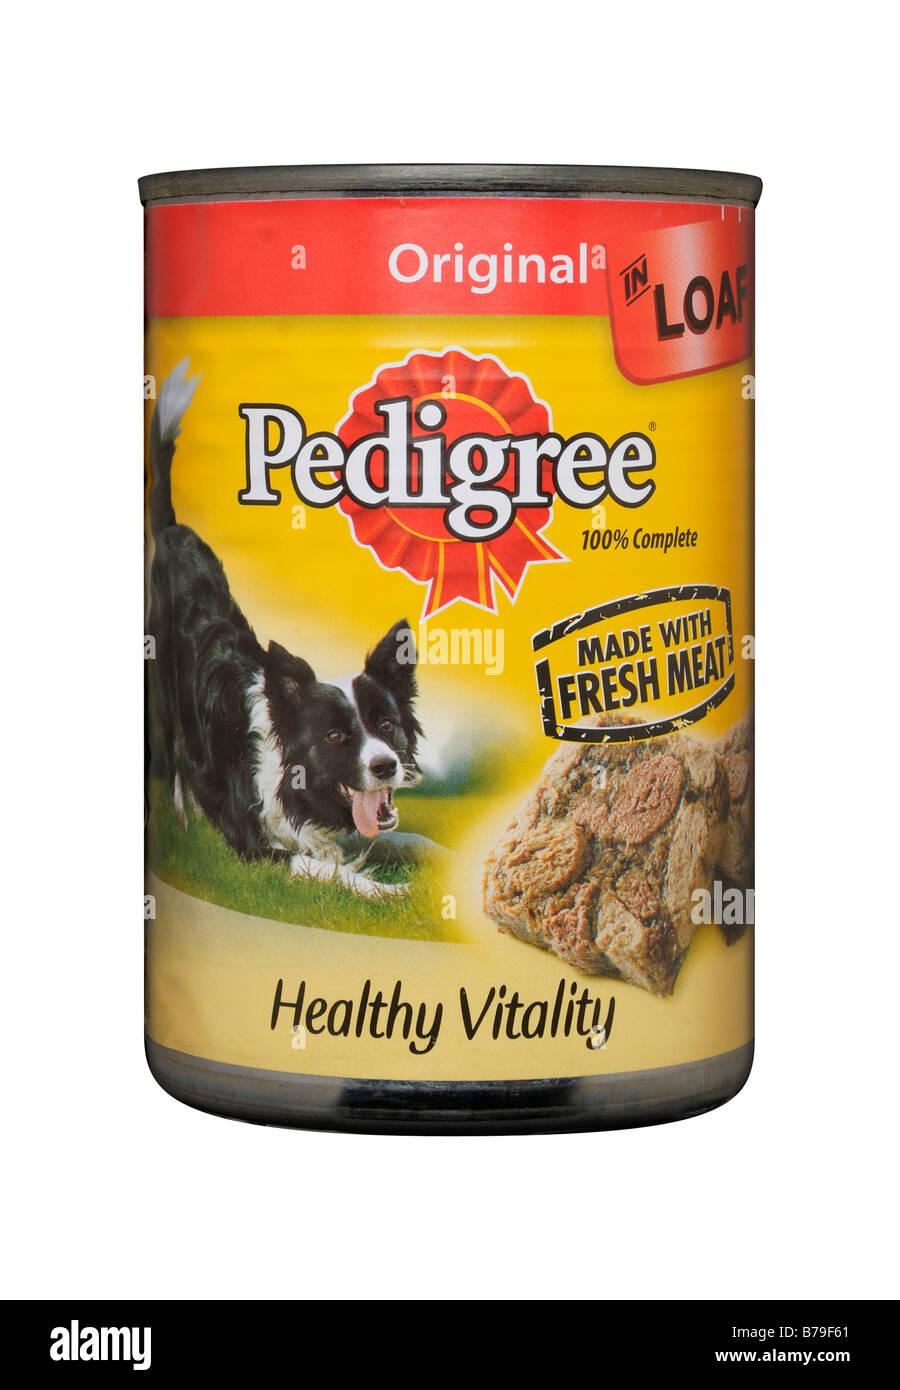 Pedigree Chum Dog Food Tin - Stock Image